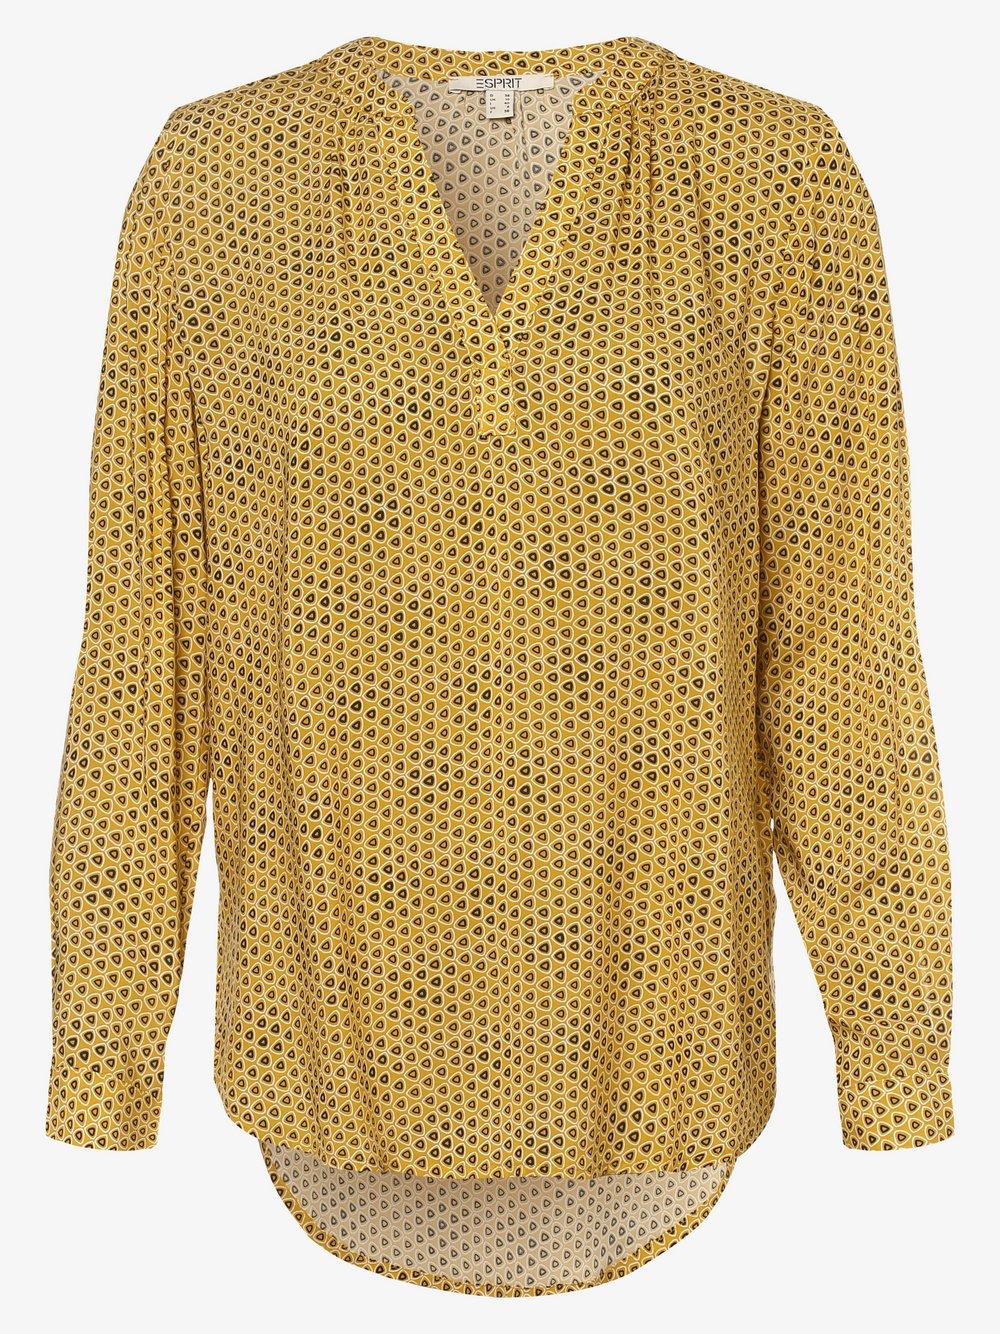 Esprit Casual – Bluzka damska, żółty Van Graaf 488710-0001-00420